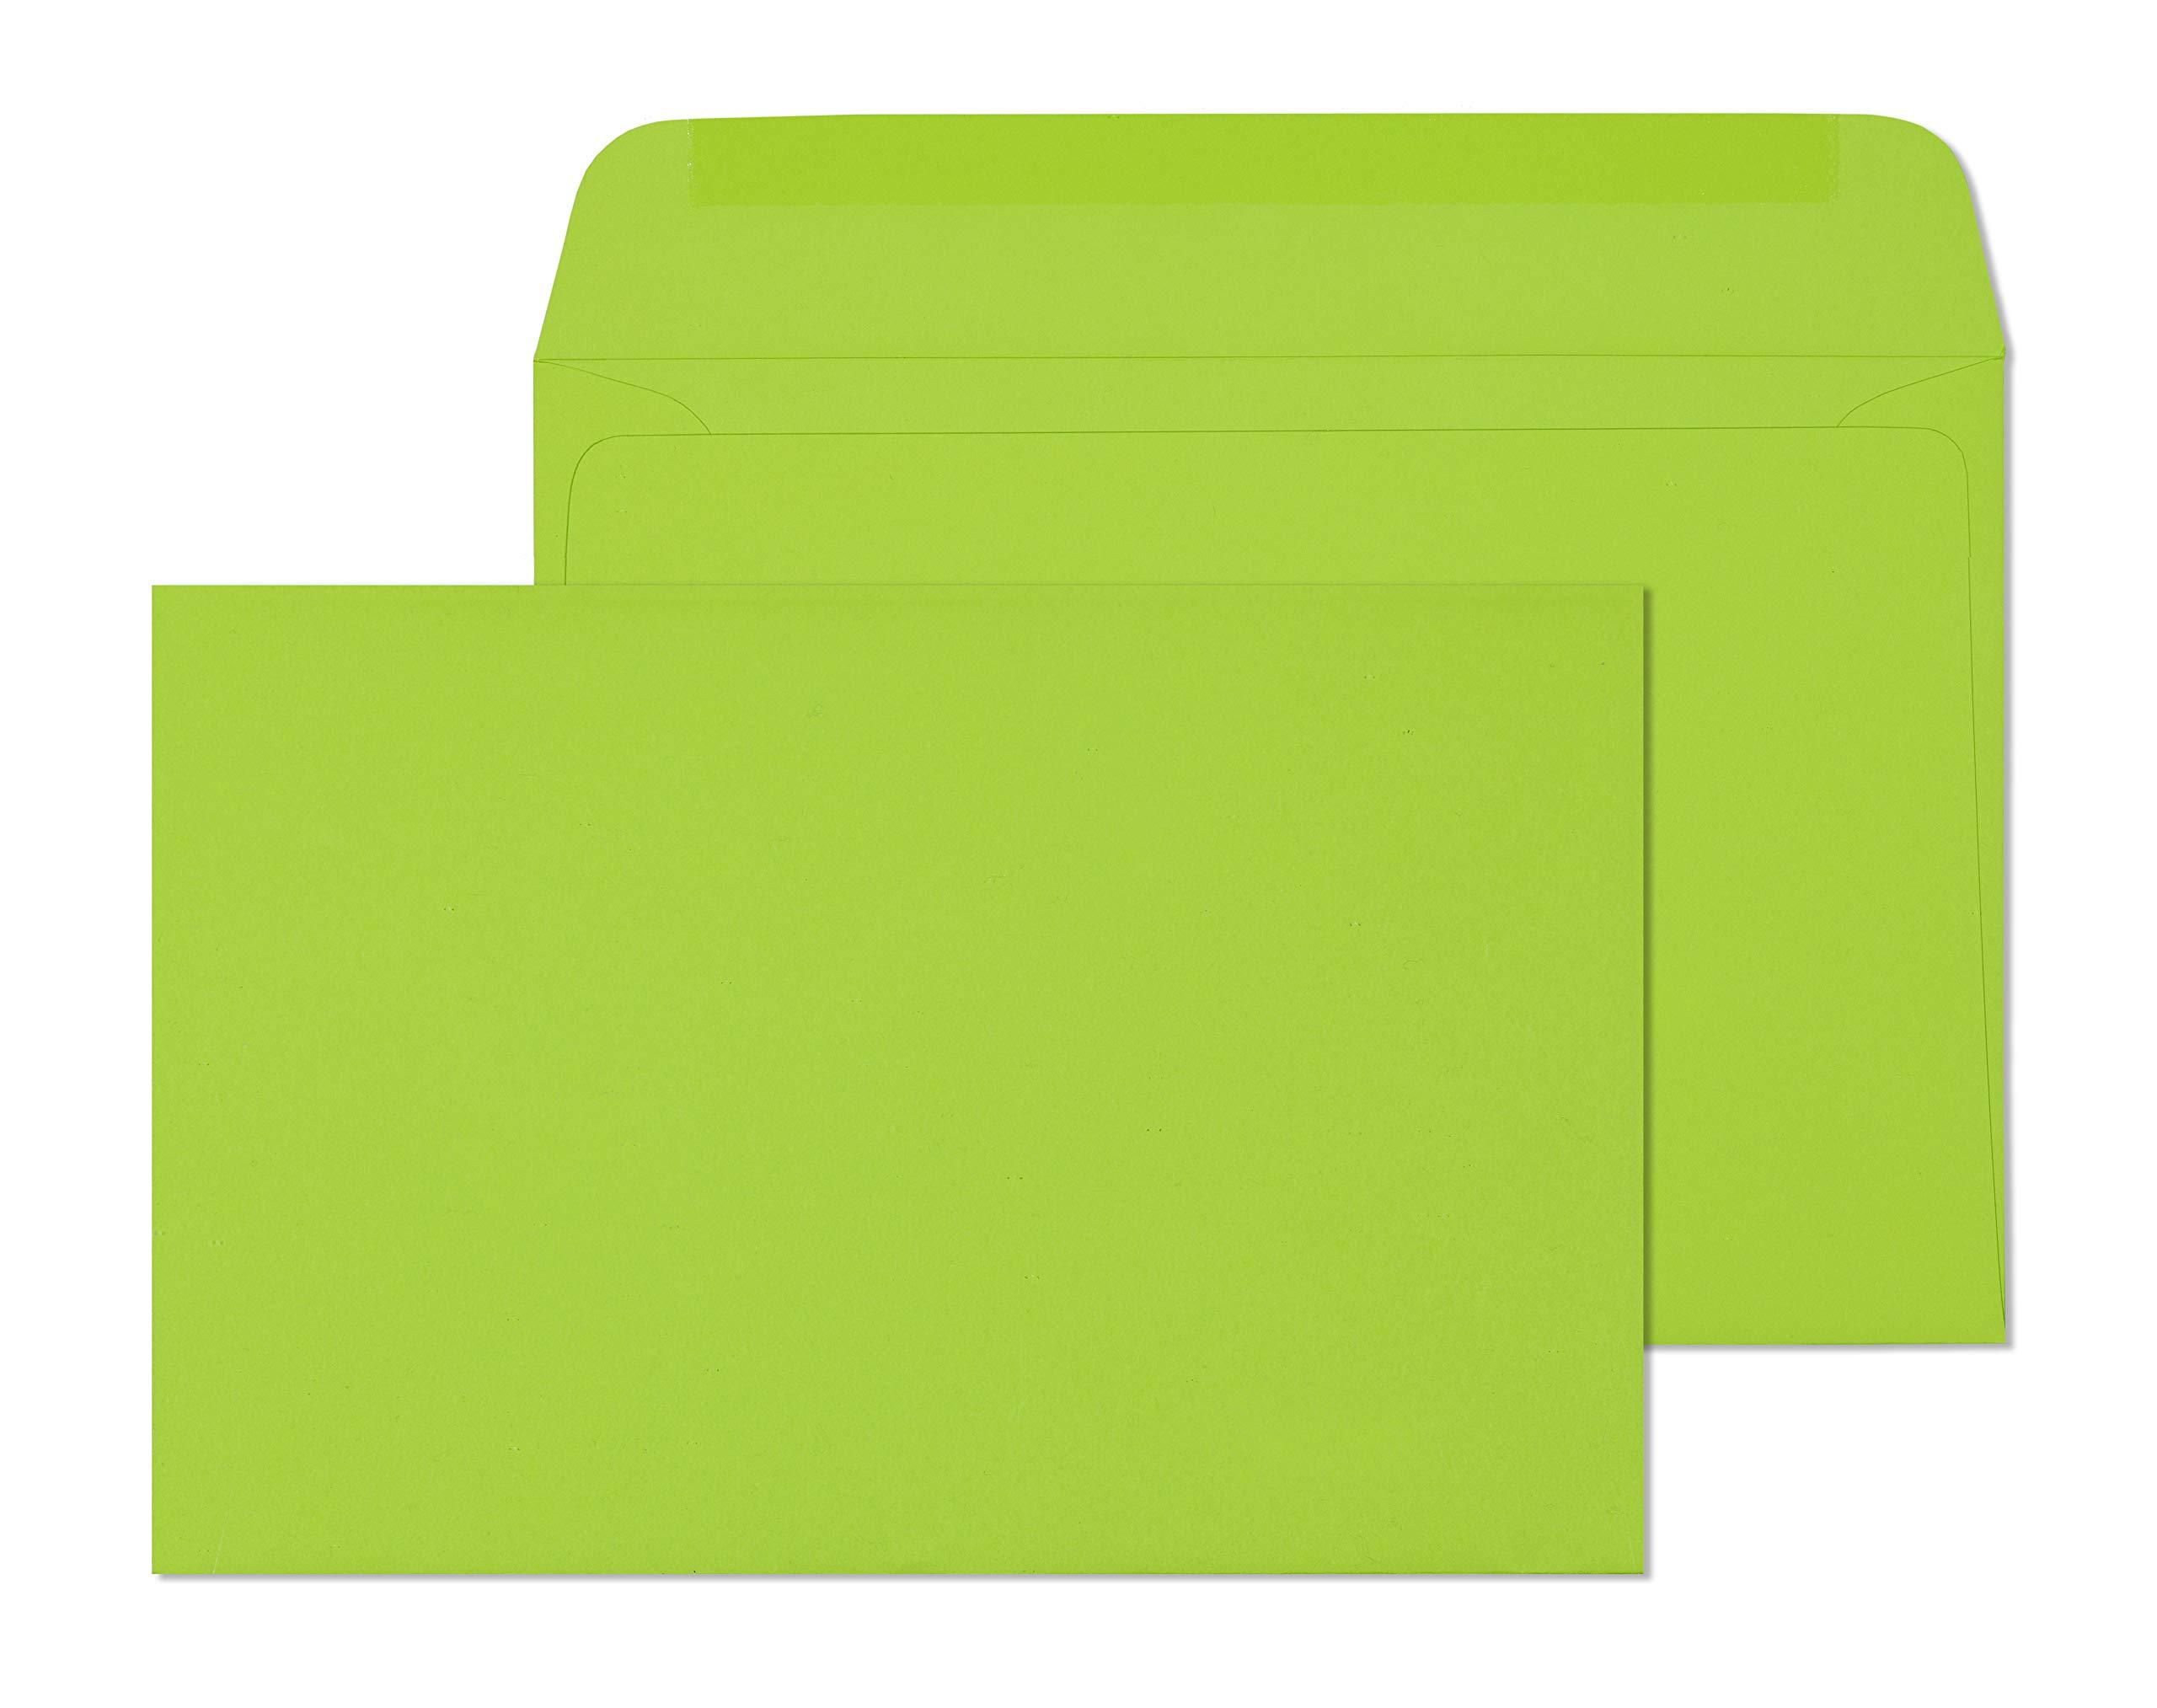 6X9 Envelope Color Blank Open Side-Greeting Card Invitation Envelopes-25 Pack (Lime)